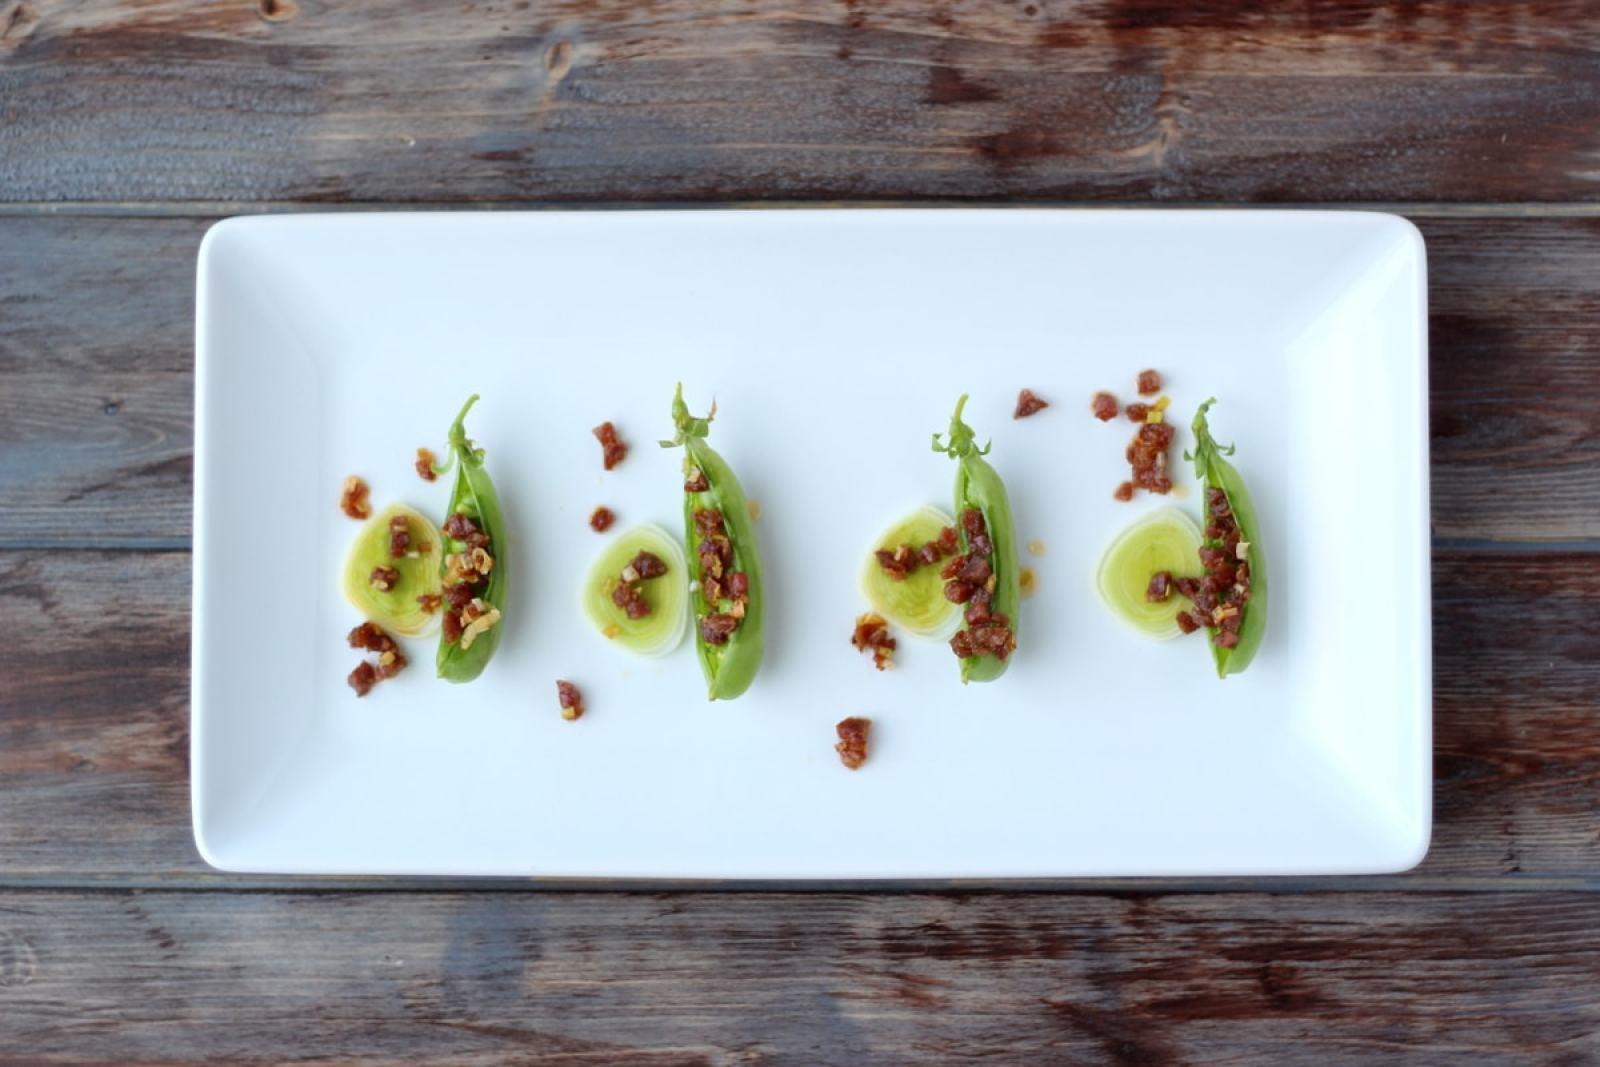 Spanish Chorizo and Leek Stuffed Pea Pods